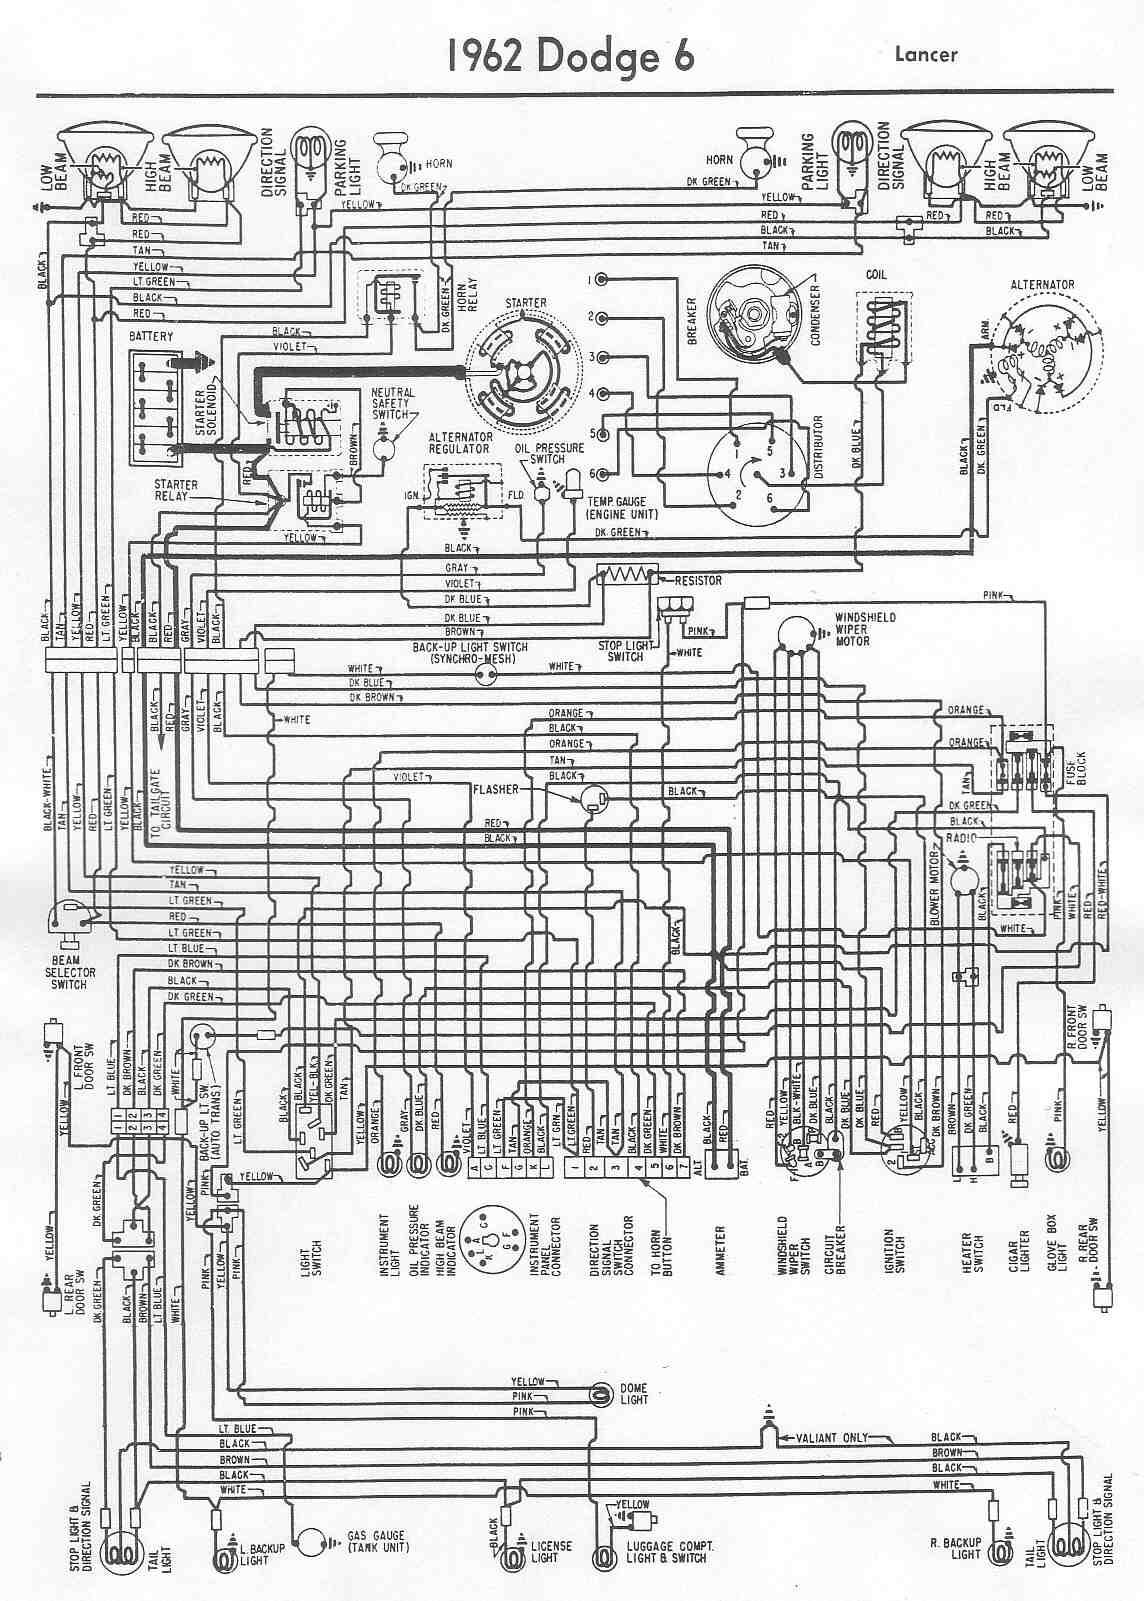 medium resolution of wiring diagram 1997 mitsubishi lancer 6 17 stromoeko de u2022wiring diagram 1997 mitsubishi lancer manual